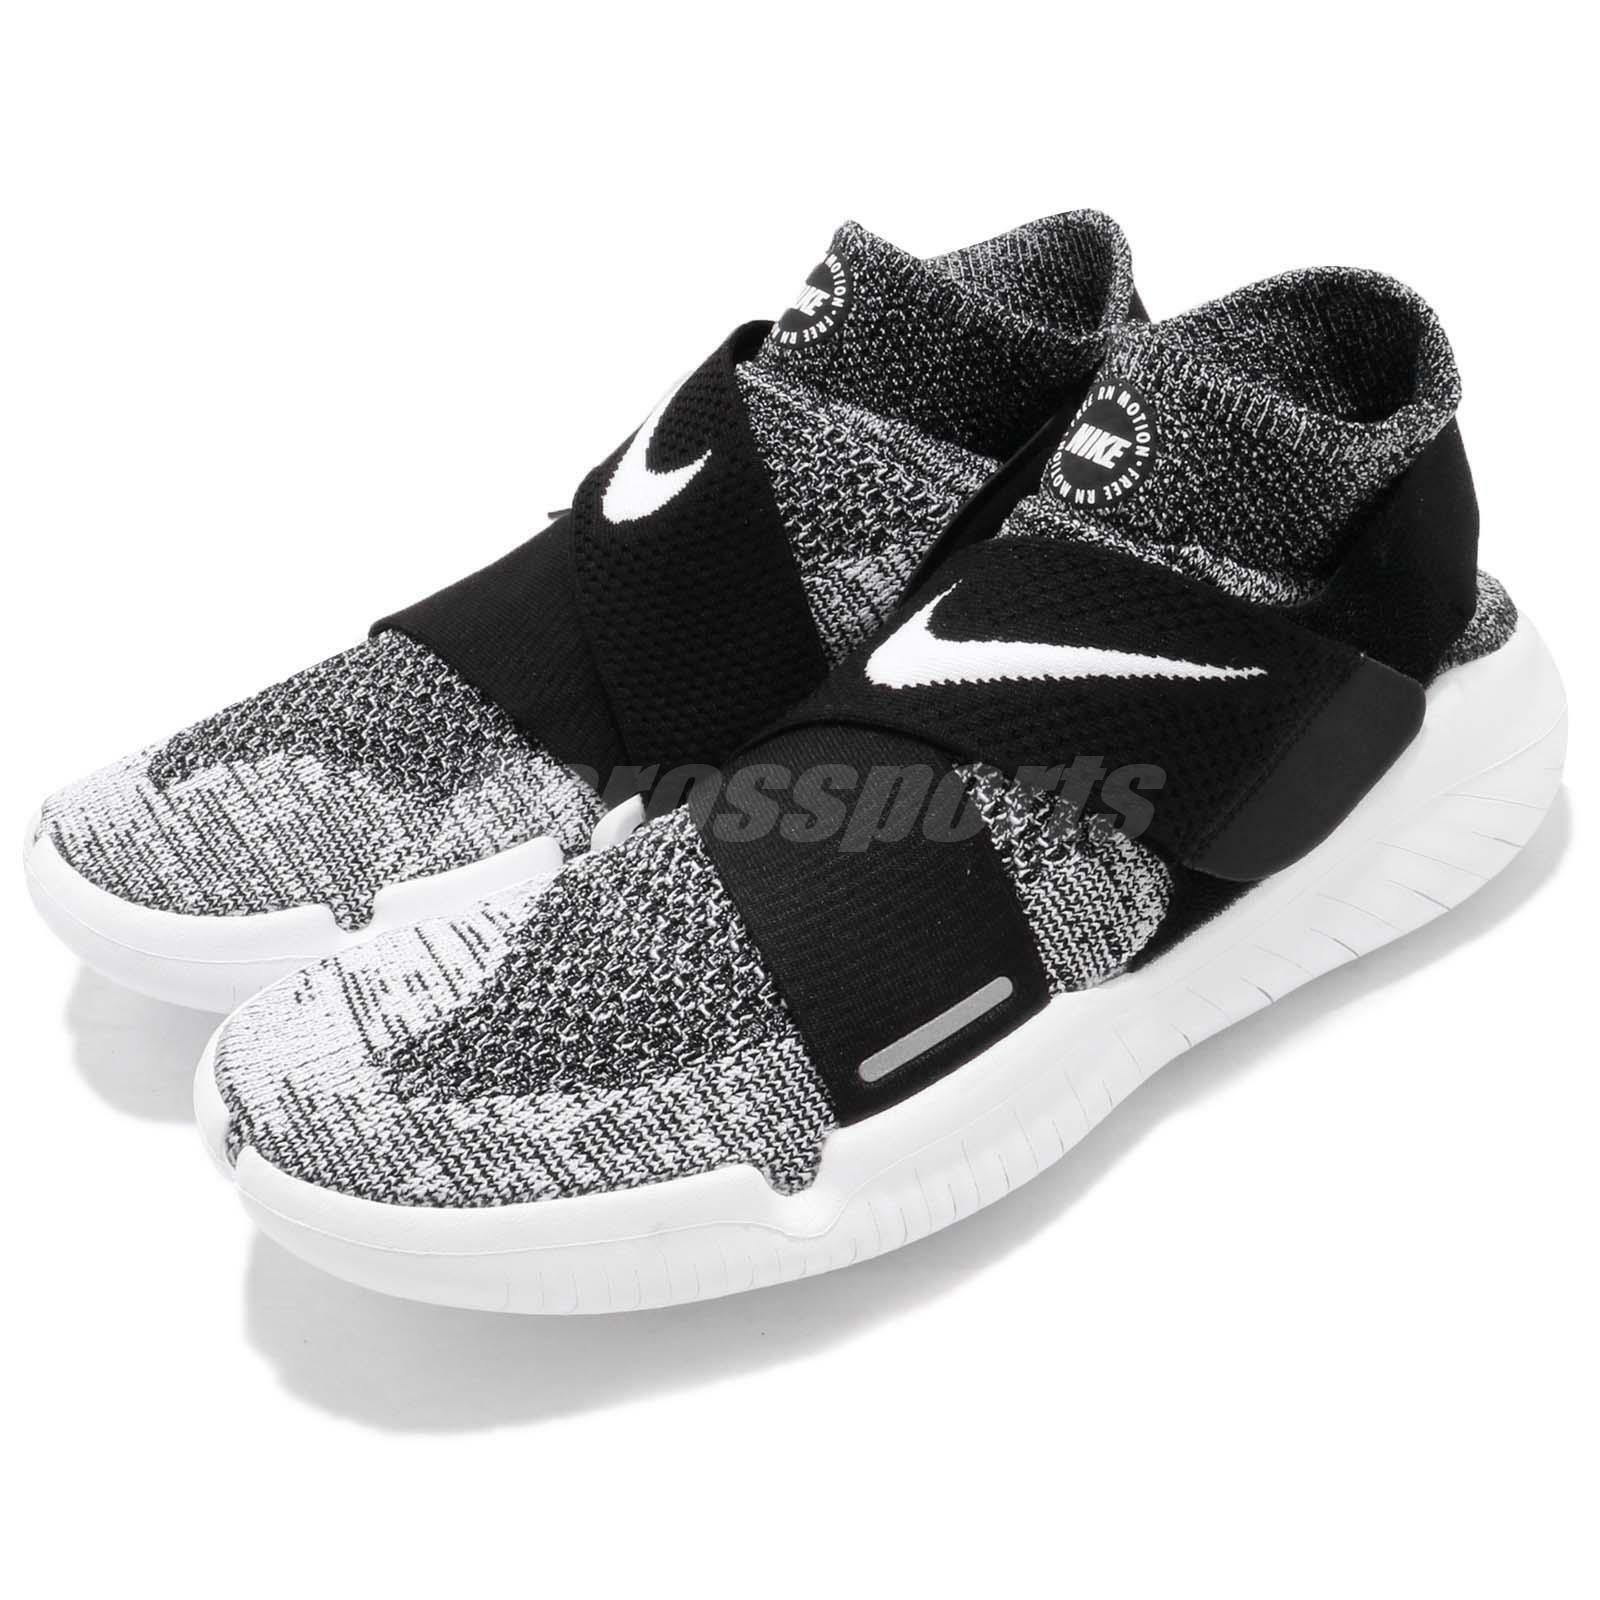 RN Motion FK 2018 Nike Free Flyknit Negro blancoo Men Running Run Zapatos 942840-001